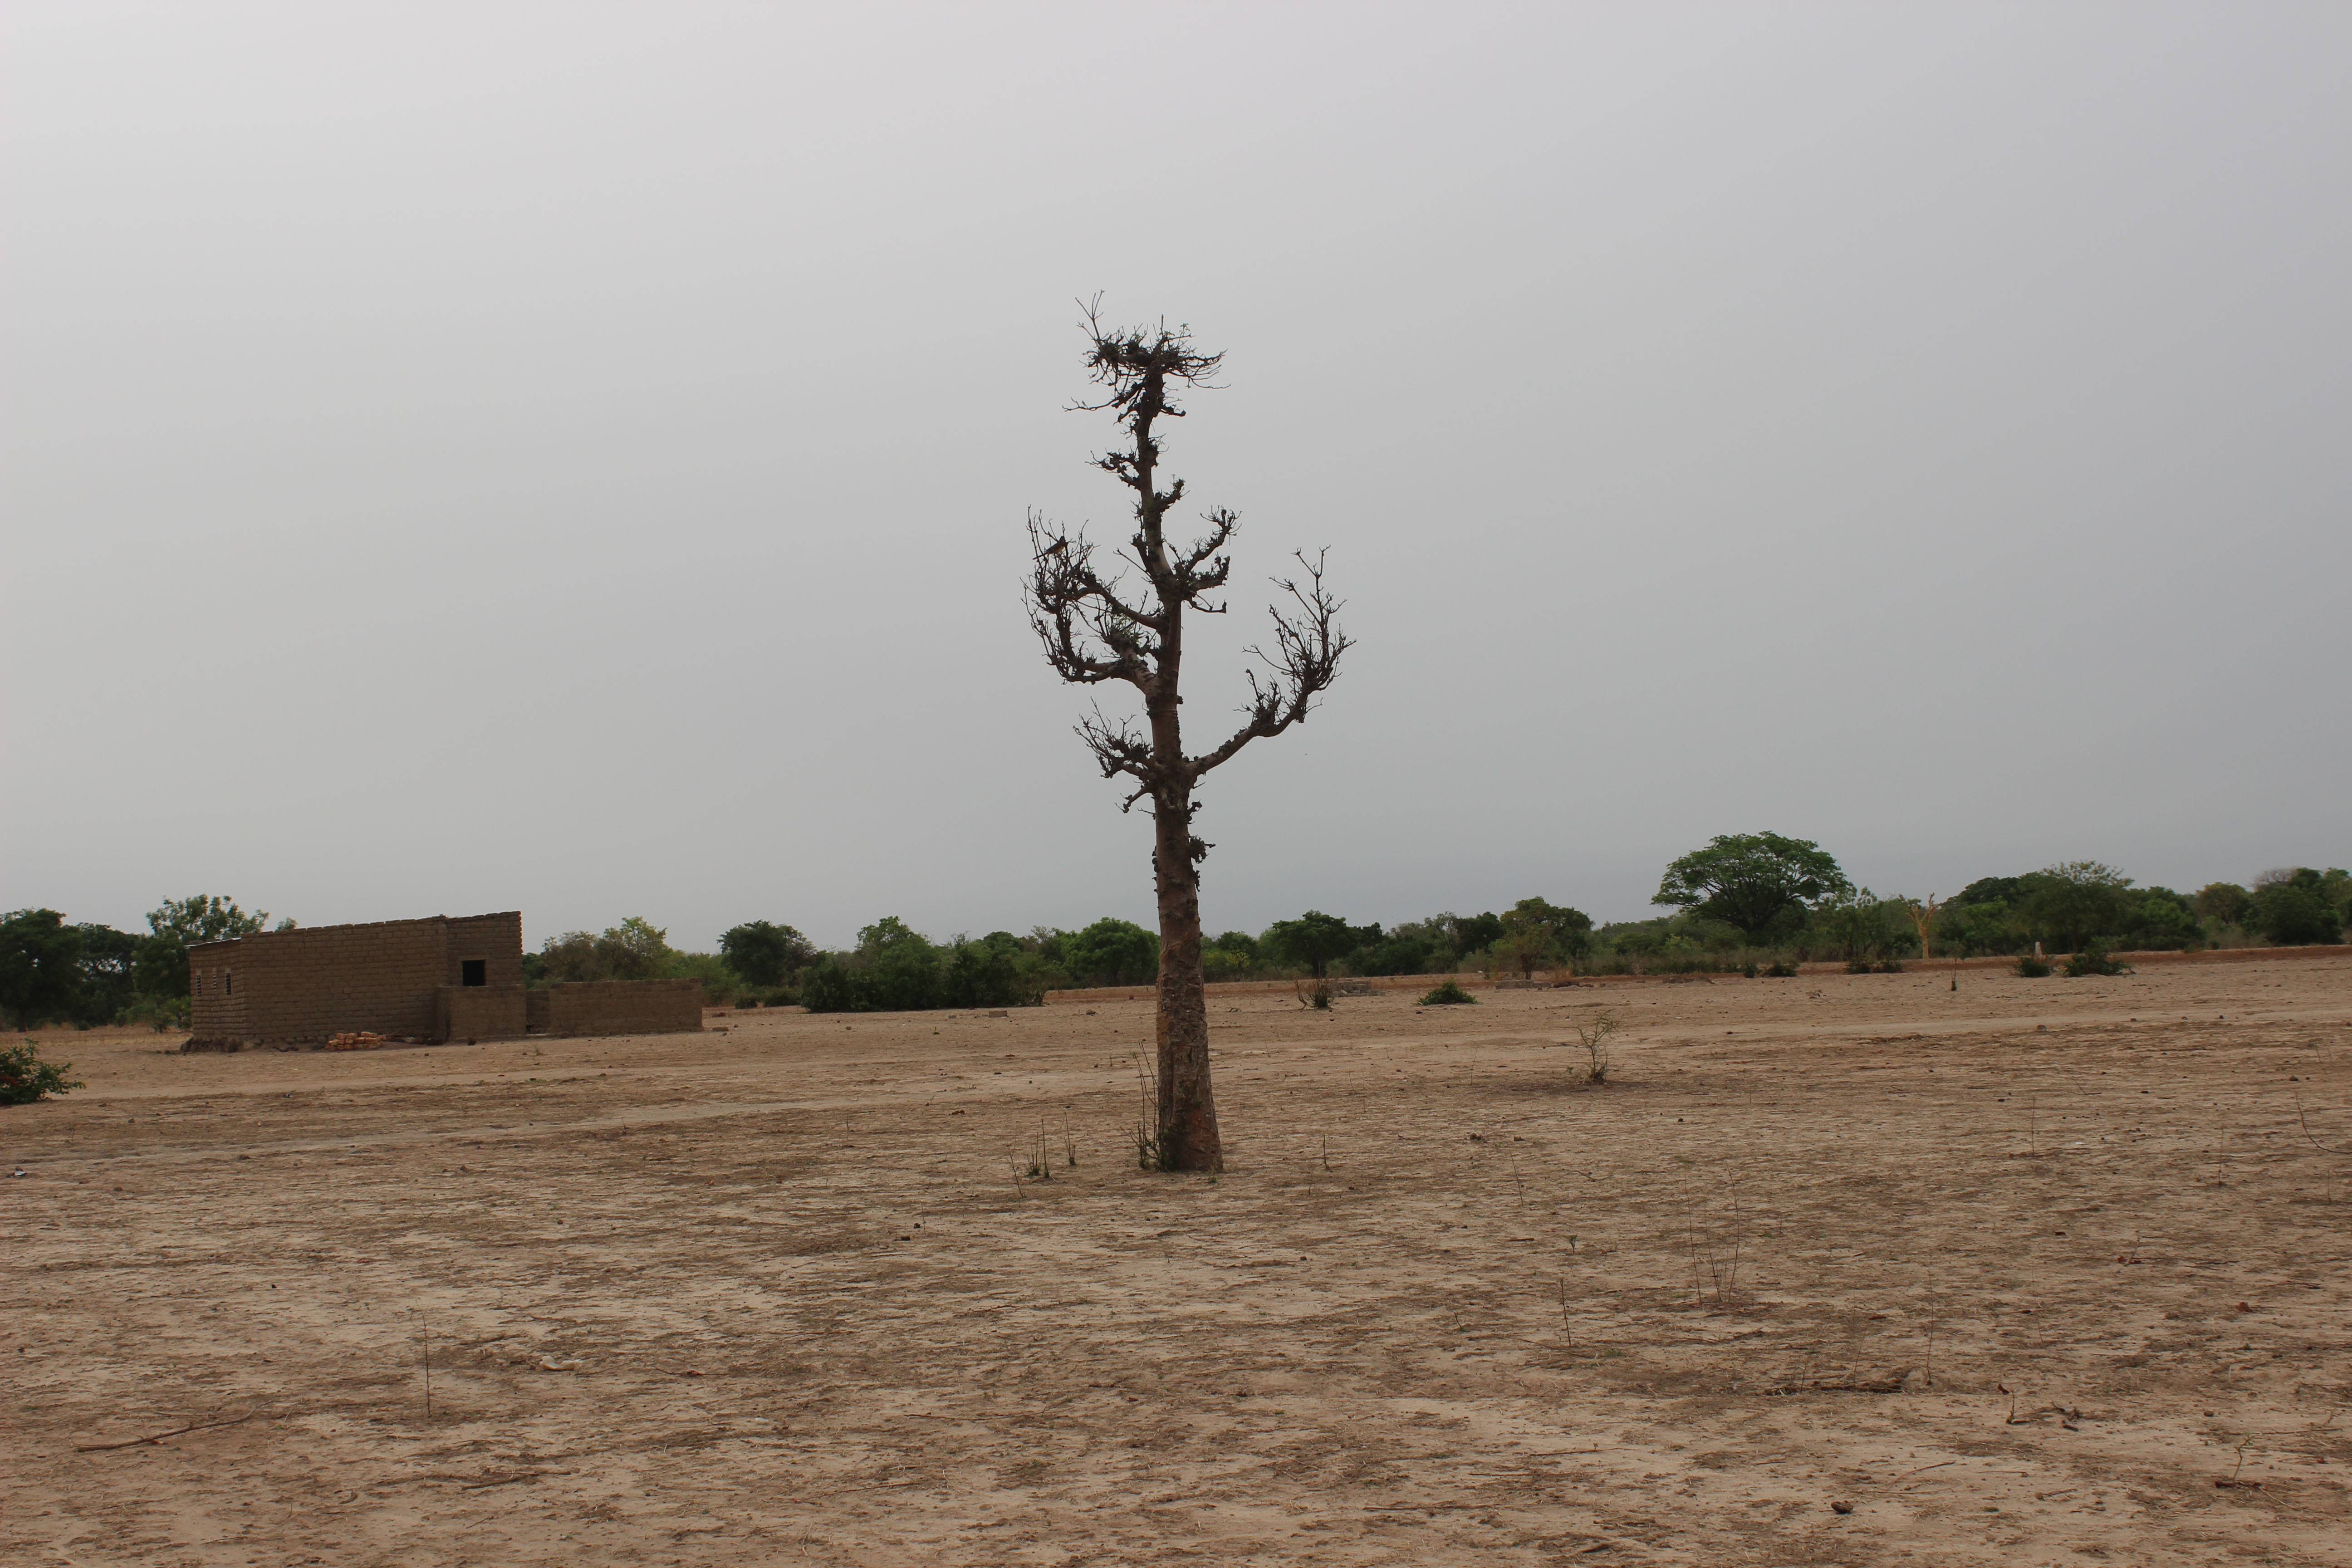 Baobab leaves (Adansonia digitata) are vitamin-rich staples in some Sahel diets, causing over-exploitation.